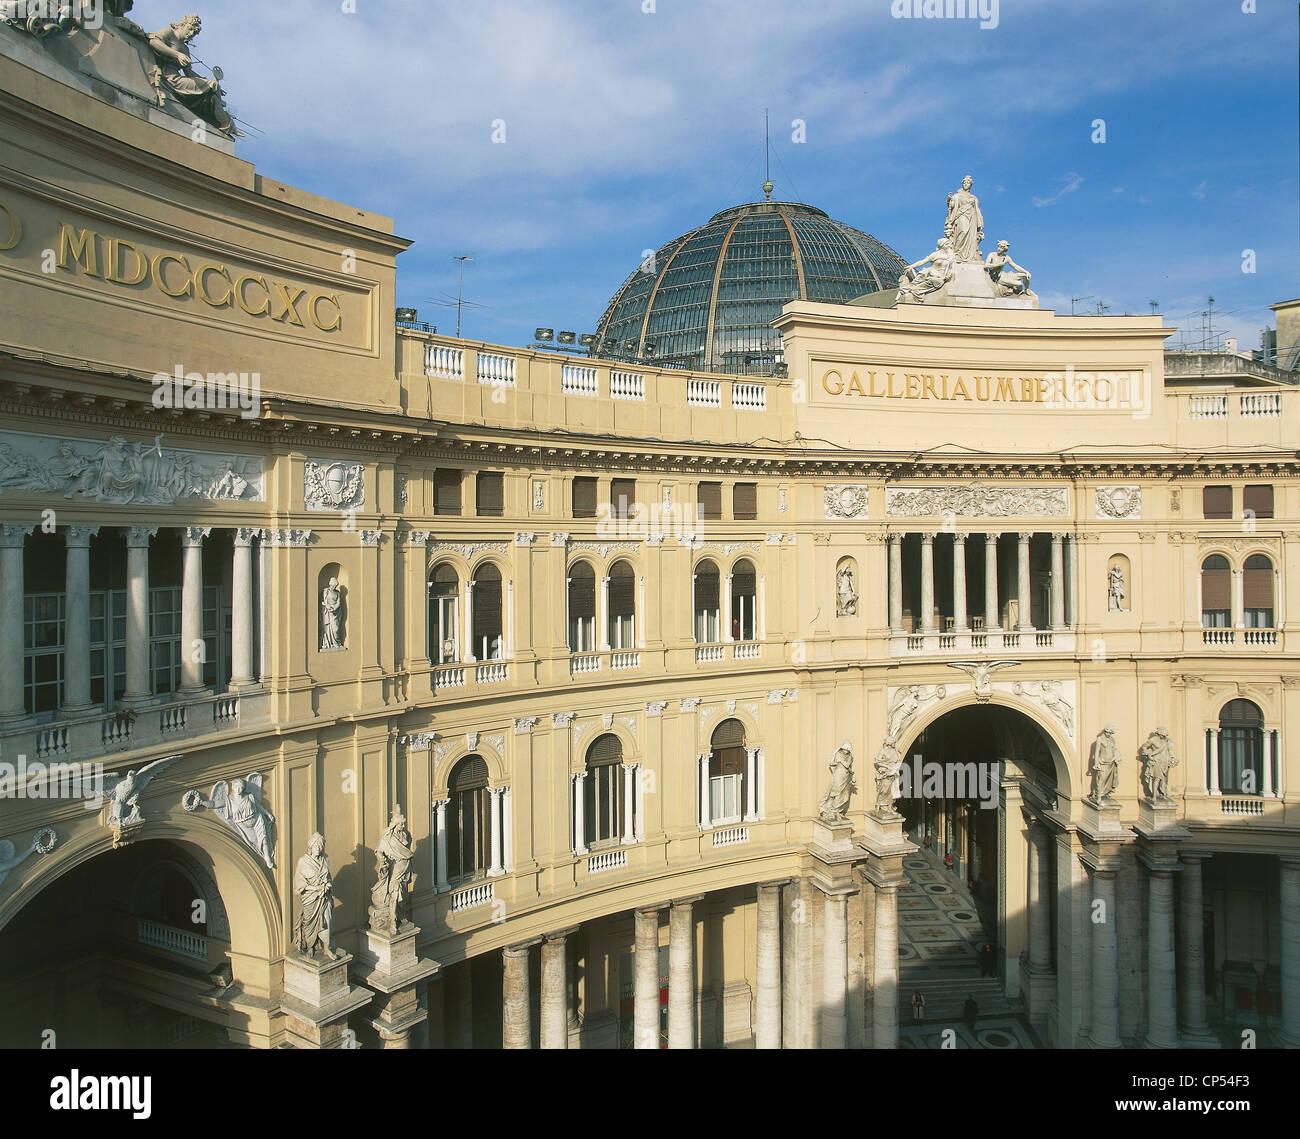 Campania - Naples. Galleria Umberto I, the nineteenth century. - Stock Image